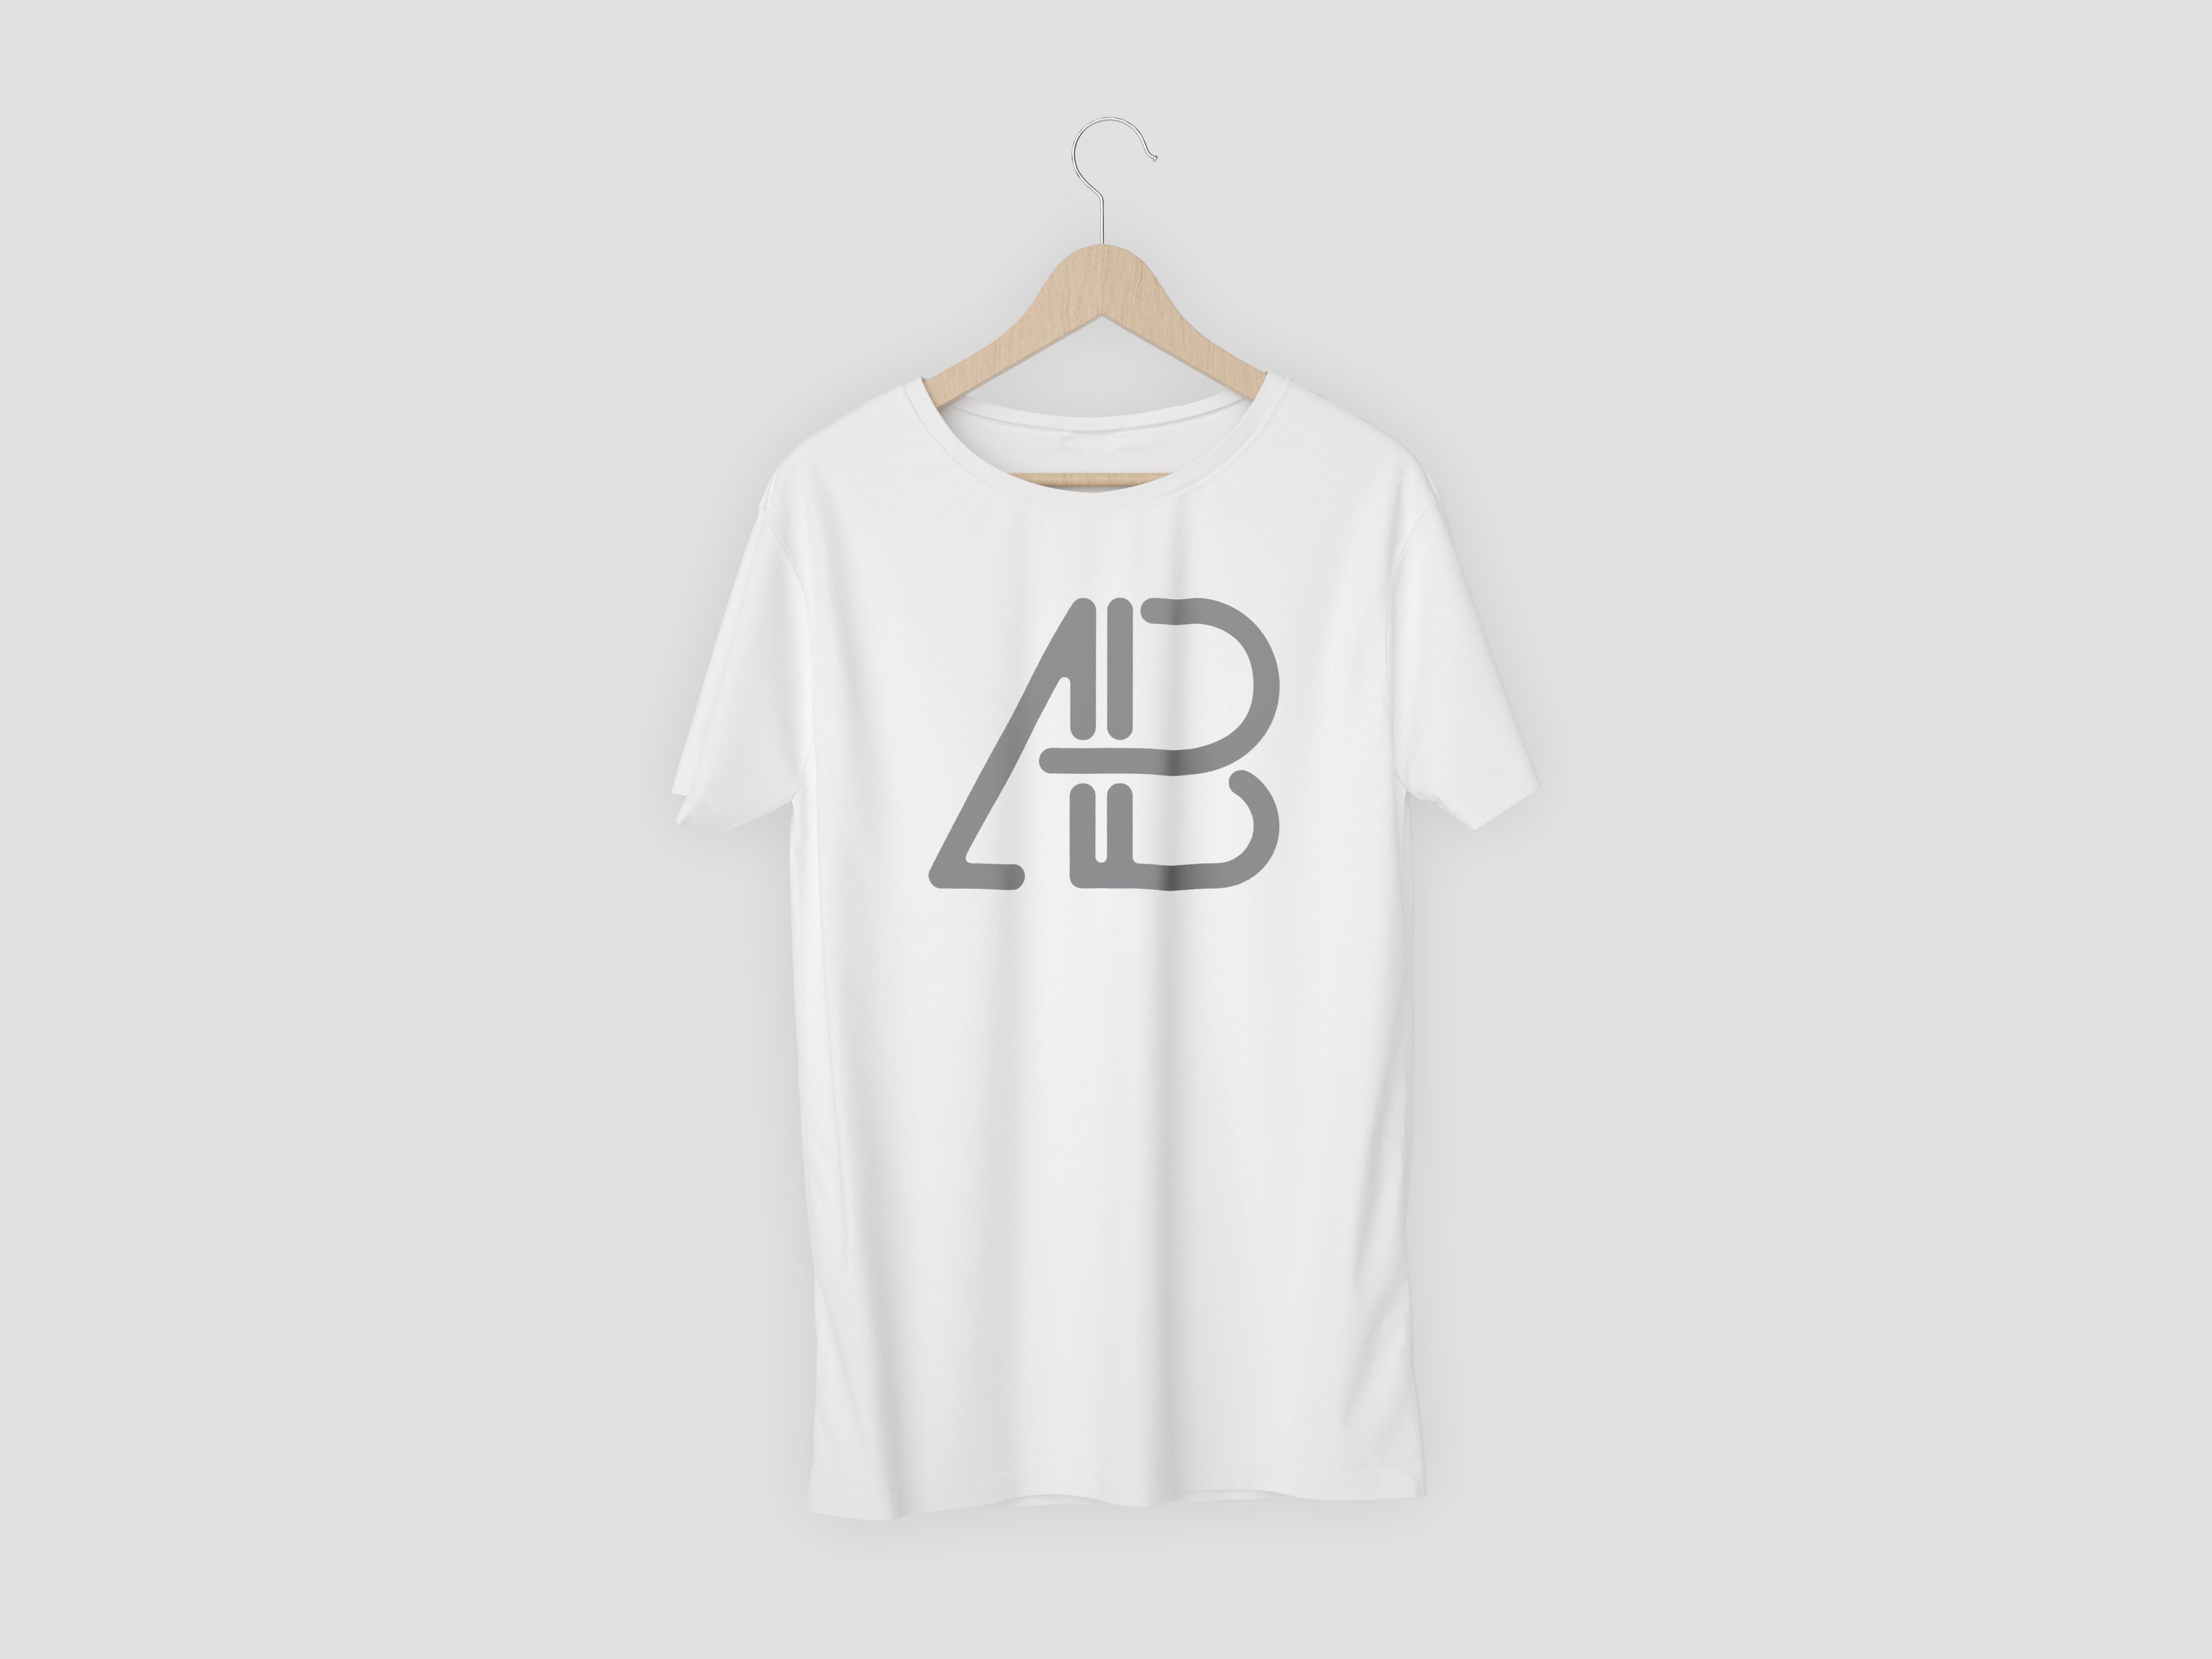 Download Free 5k T Shirt Mockup Psd Clothing Mockup Shirt Mockup Tshirt Mockup